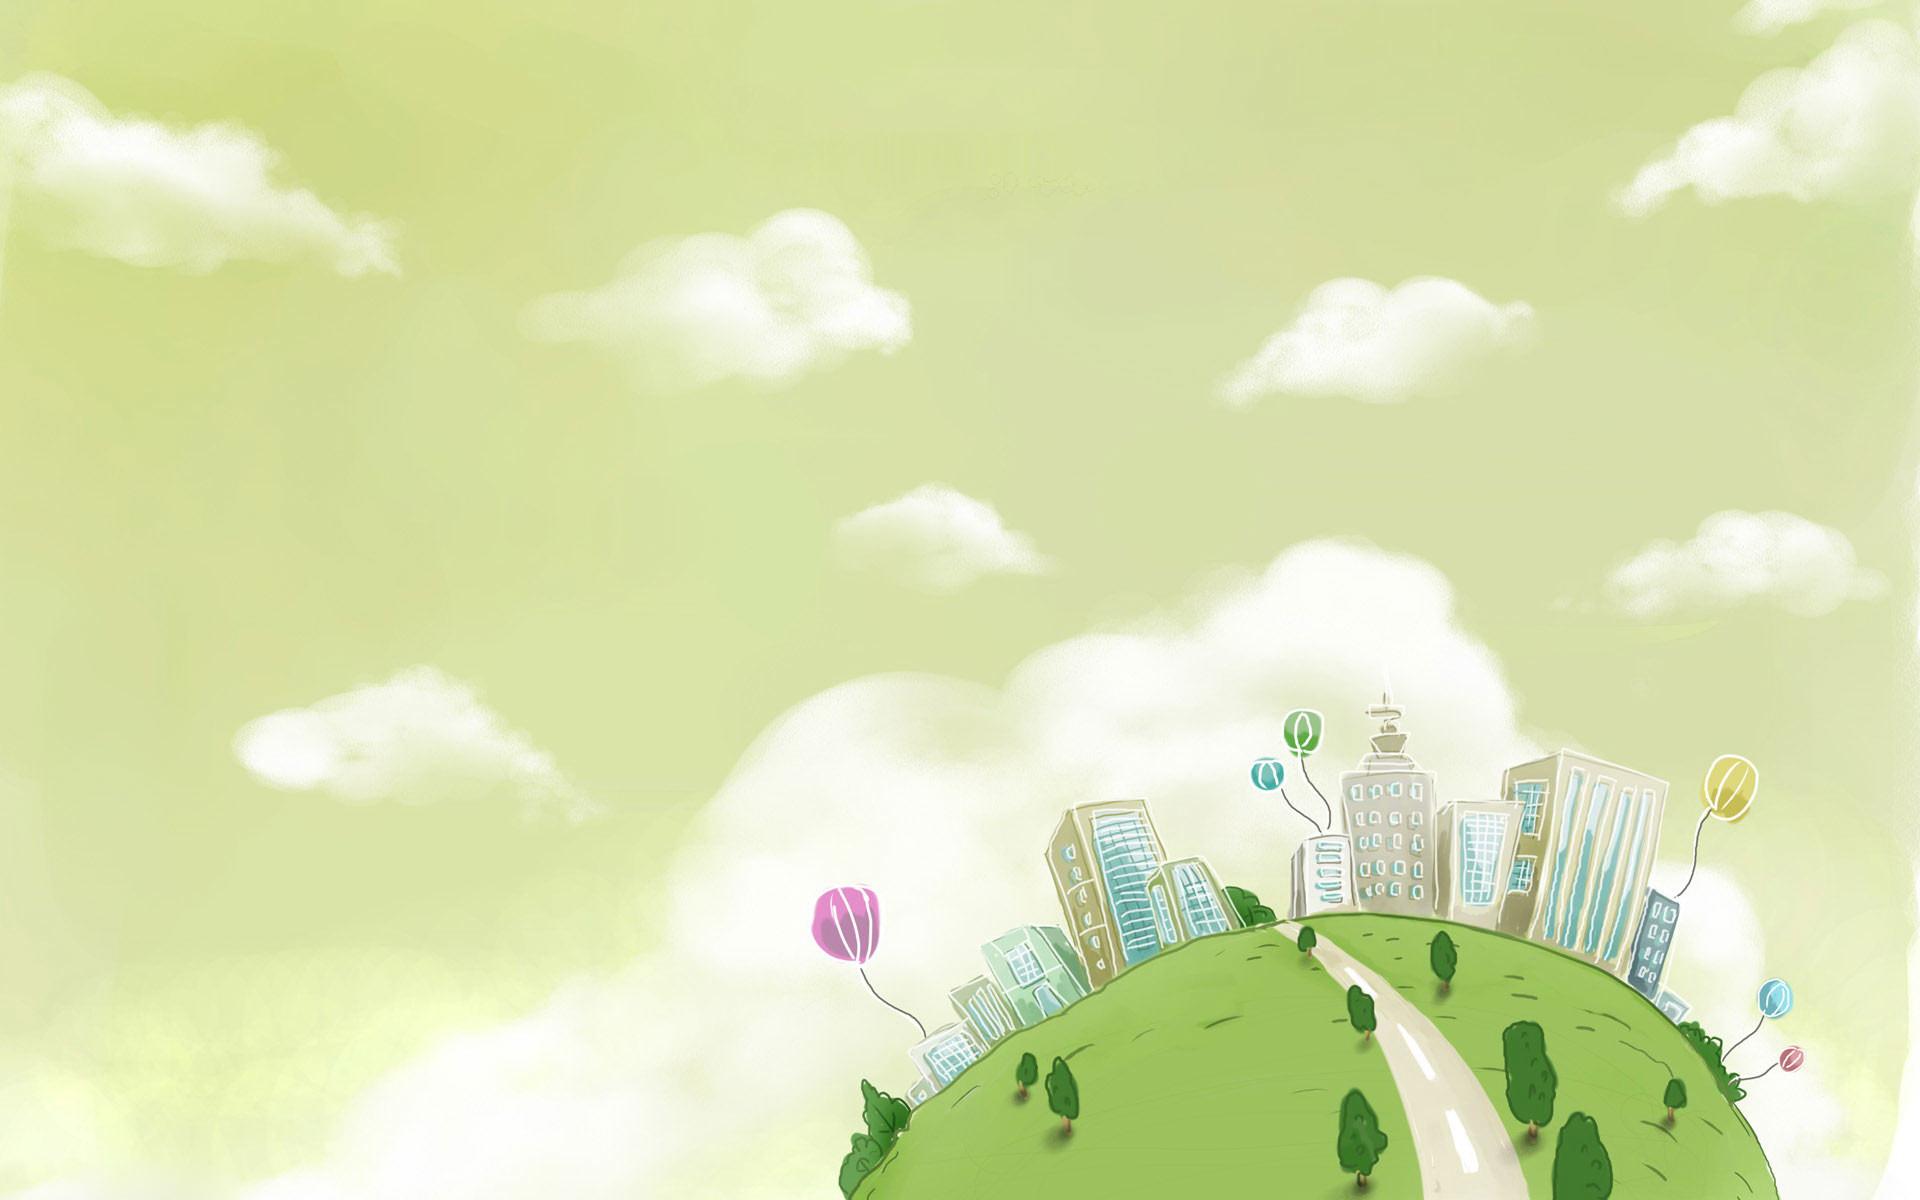 Cute Cartoon Wallpapers Creative CanCreative Can | HD Wallpapers |  Pinterest | Cartoon wallpaper and Wallpaper